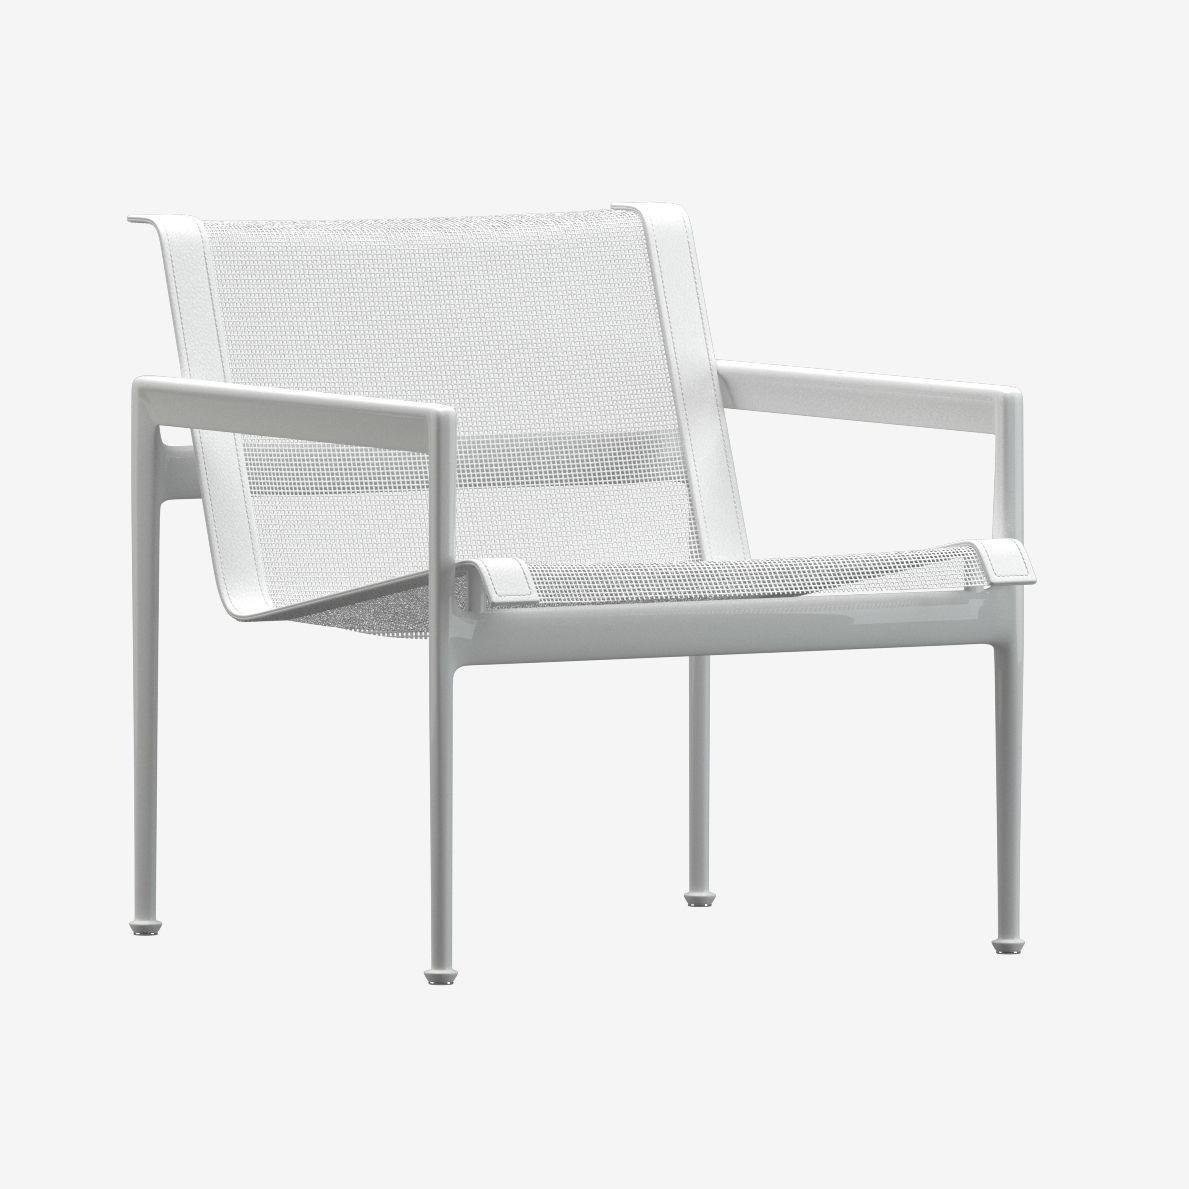 Superior ... Hive Modern Richard Schultz 1966 Lounge Chair 3d Model Max Obj Fbx Mtl  5 ...